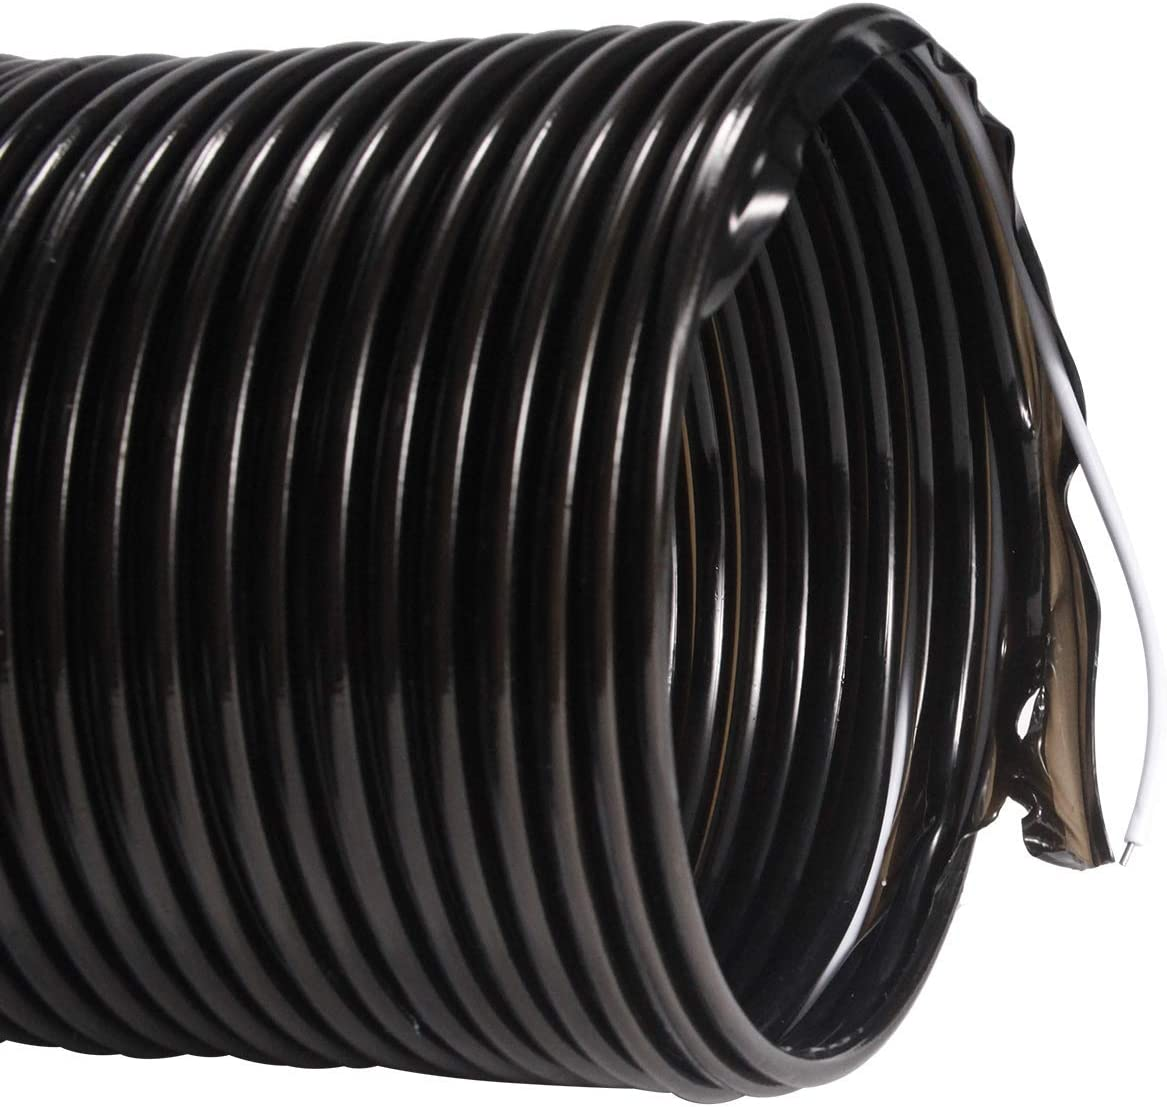 /ø100mm*2m, Negro Conducto de Aire Flexible para Secadora Universal Hon/&Guan Manguera de Ventilaci/ón de PVC de Alta Presi/ón para Entrega de Polvo L/íquido y Gas